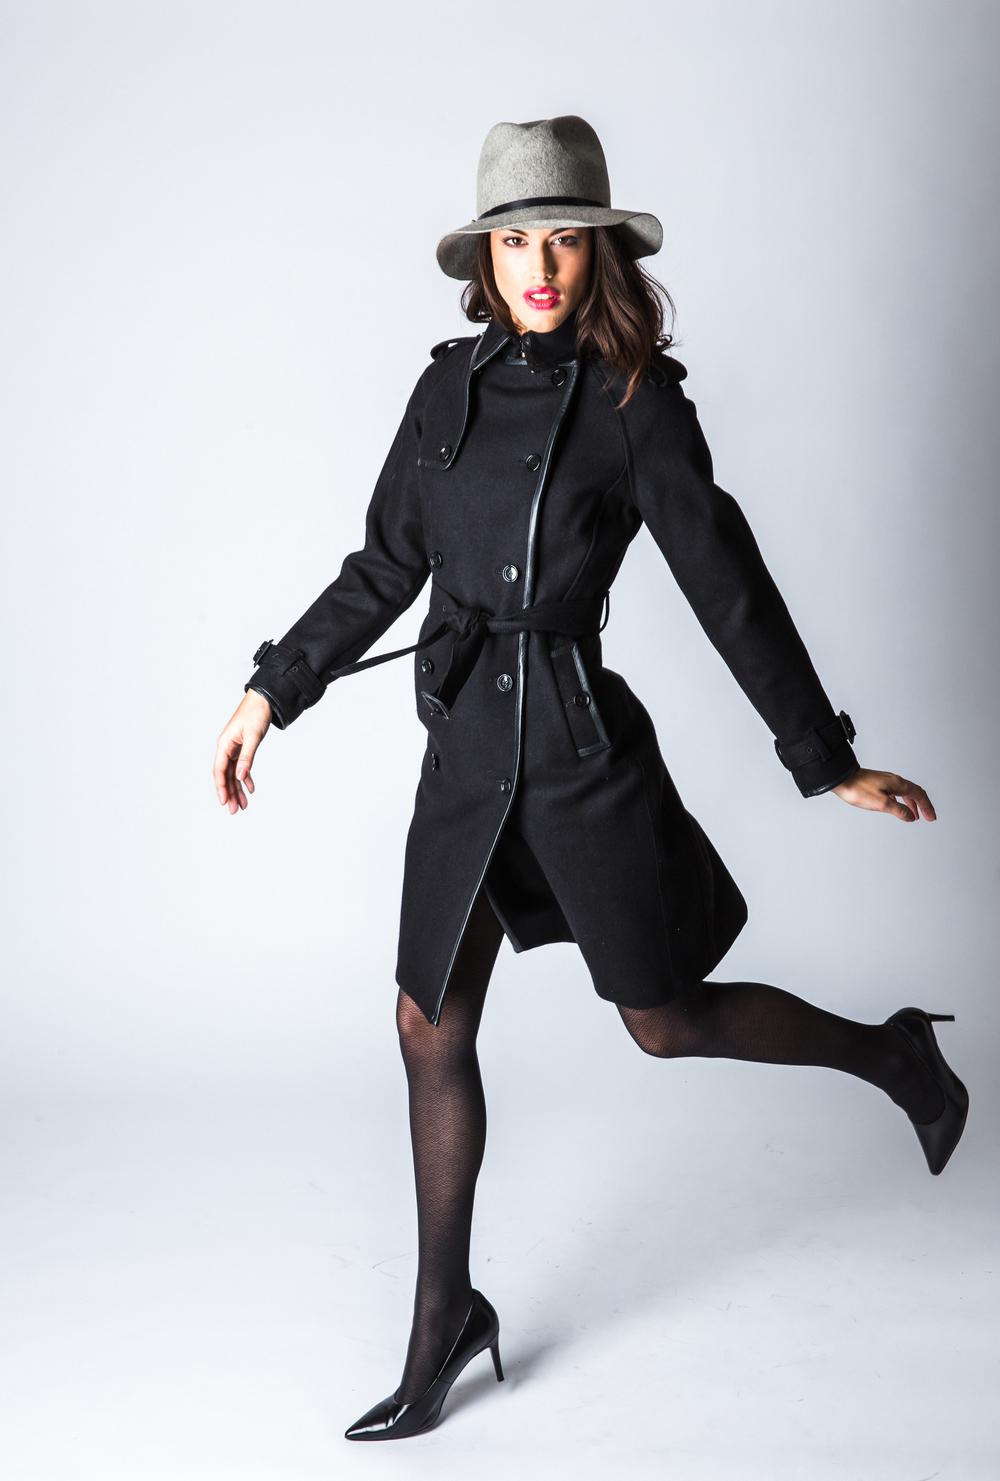 Featuring J.Lindeberg Deidra Smooth Wool Melton Jacket $695